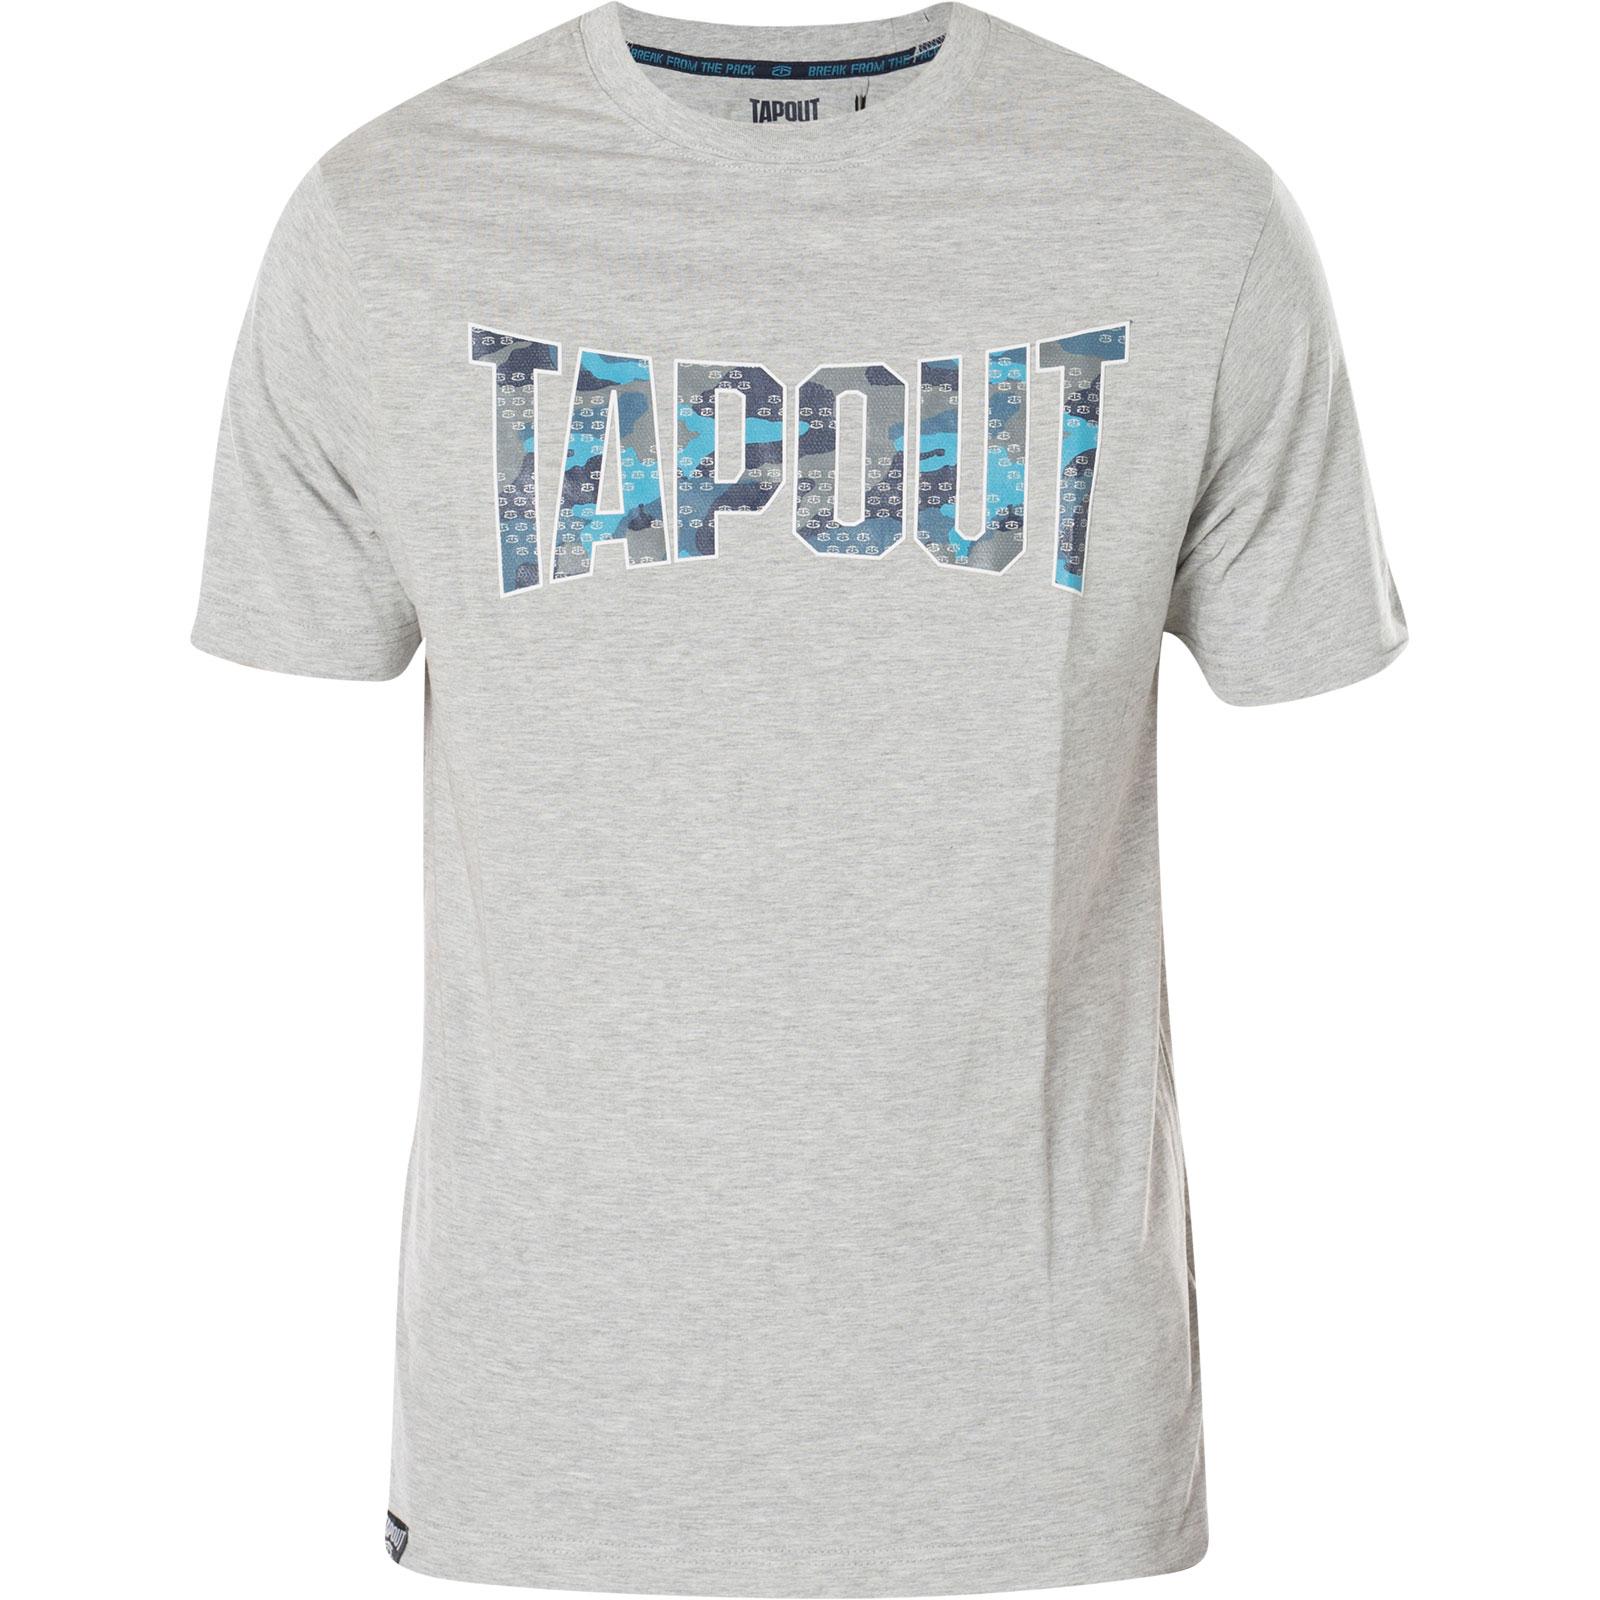 e7f150dc4482e0 Tapout T Shirts On Sale - BCD Tofu House